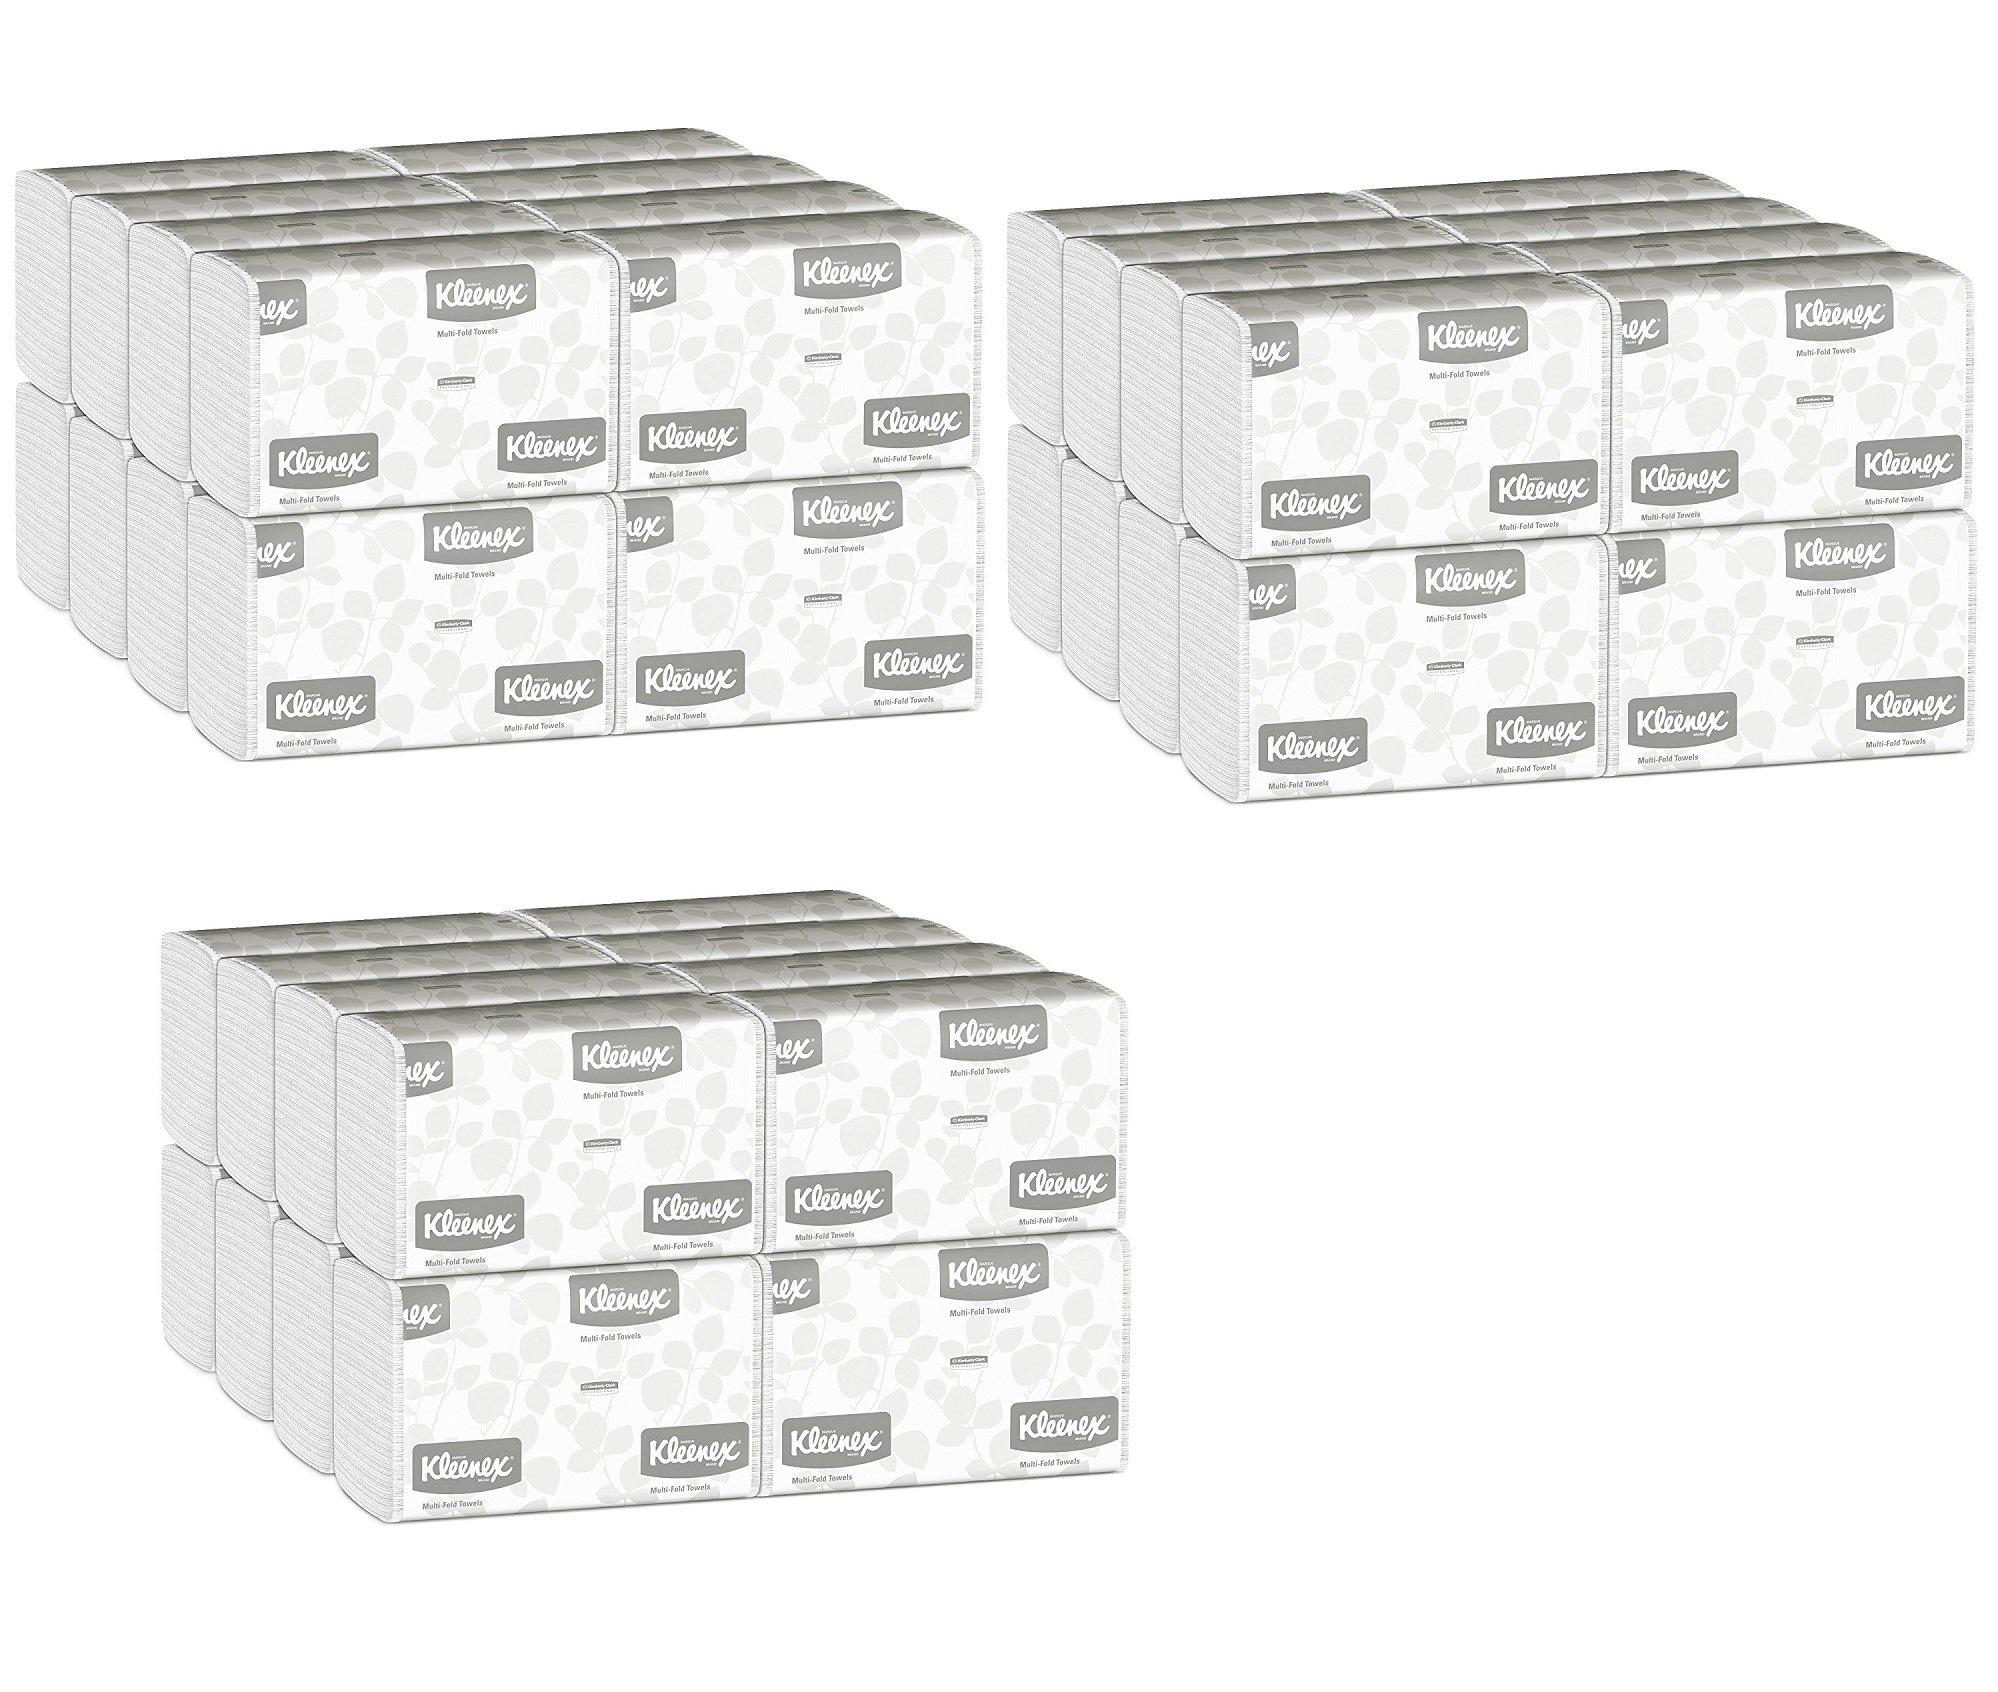 Kleenex Multifold Paper Towels (01890), White, Case of 48 Packs vLCahU, 150 Tri Fold Paper Towels per Pack